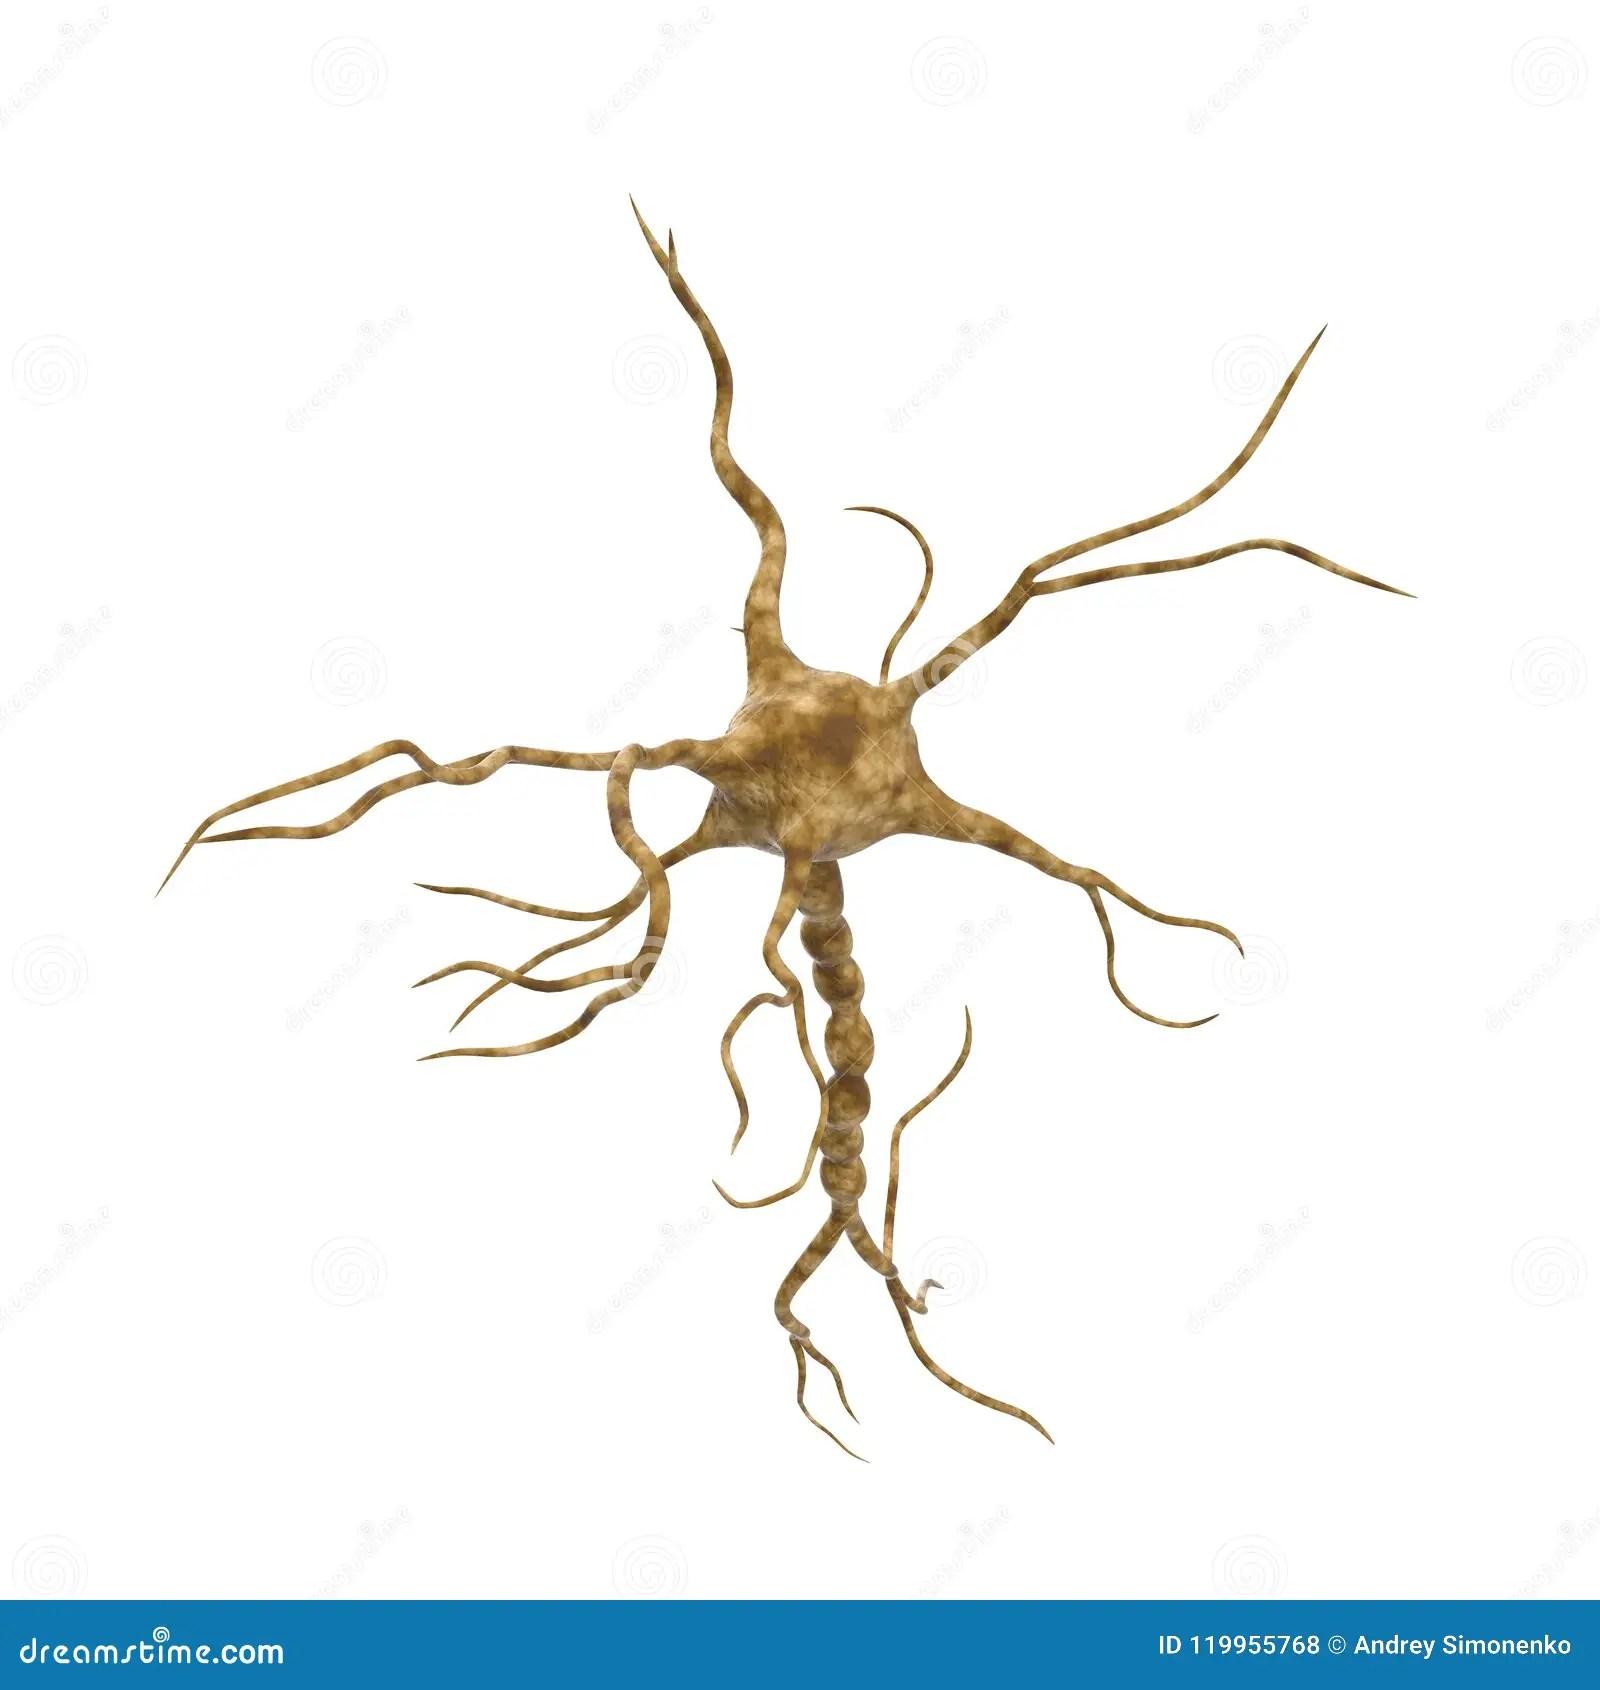 hight resolution of single neuron nervous system on white background 3d illustration